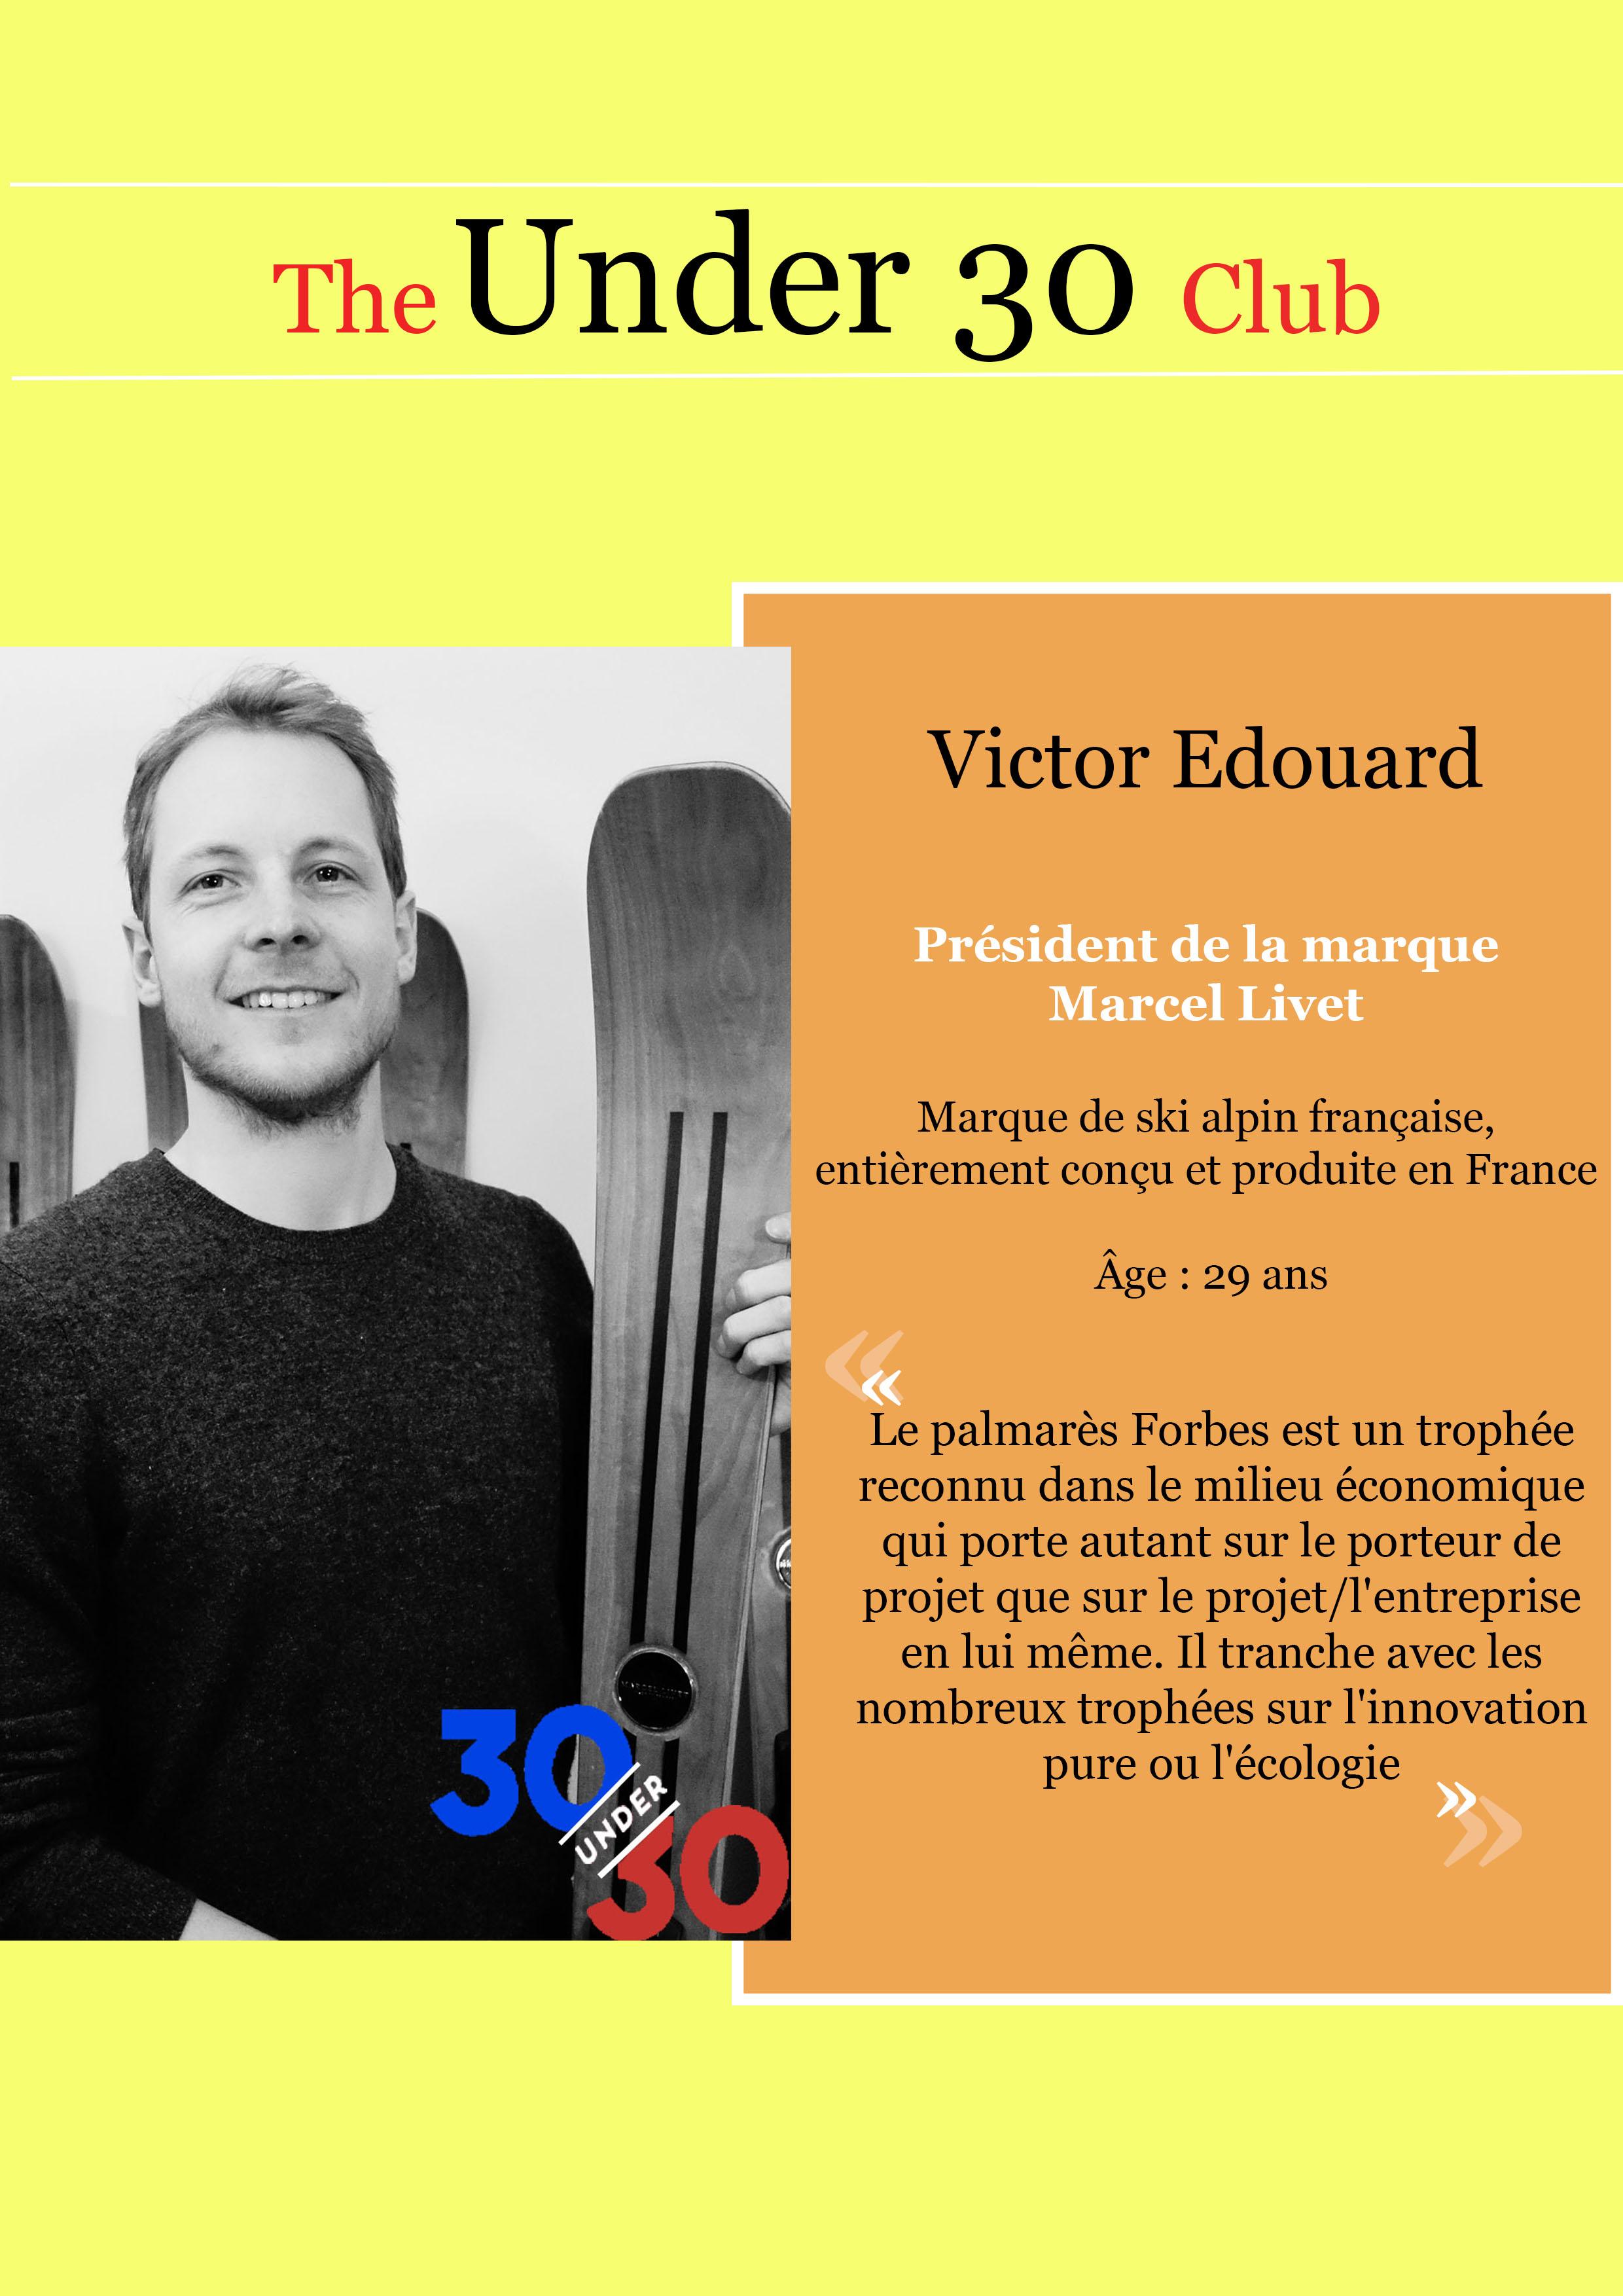 Victor Edouard